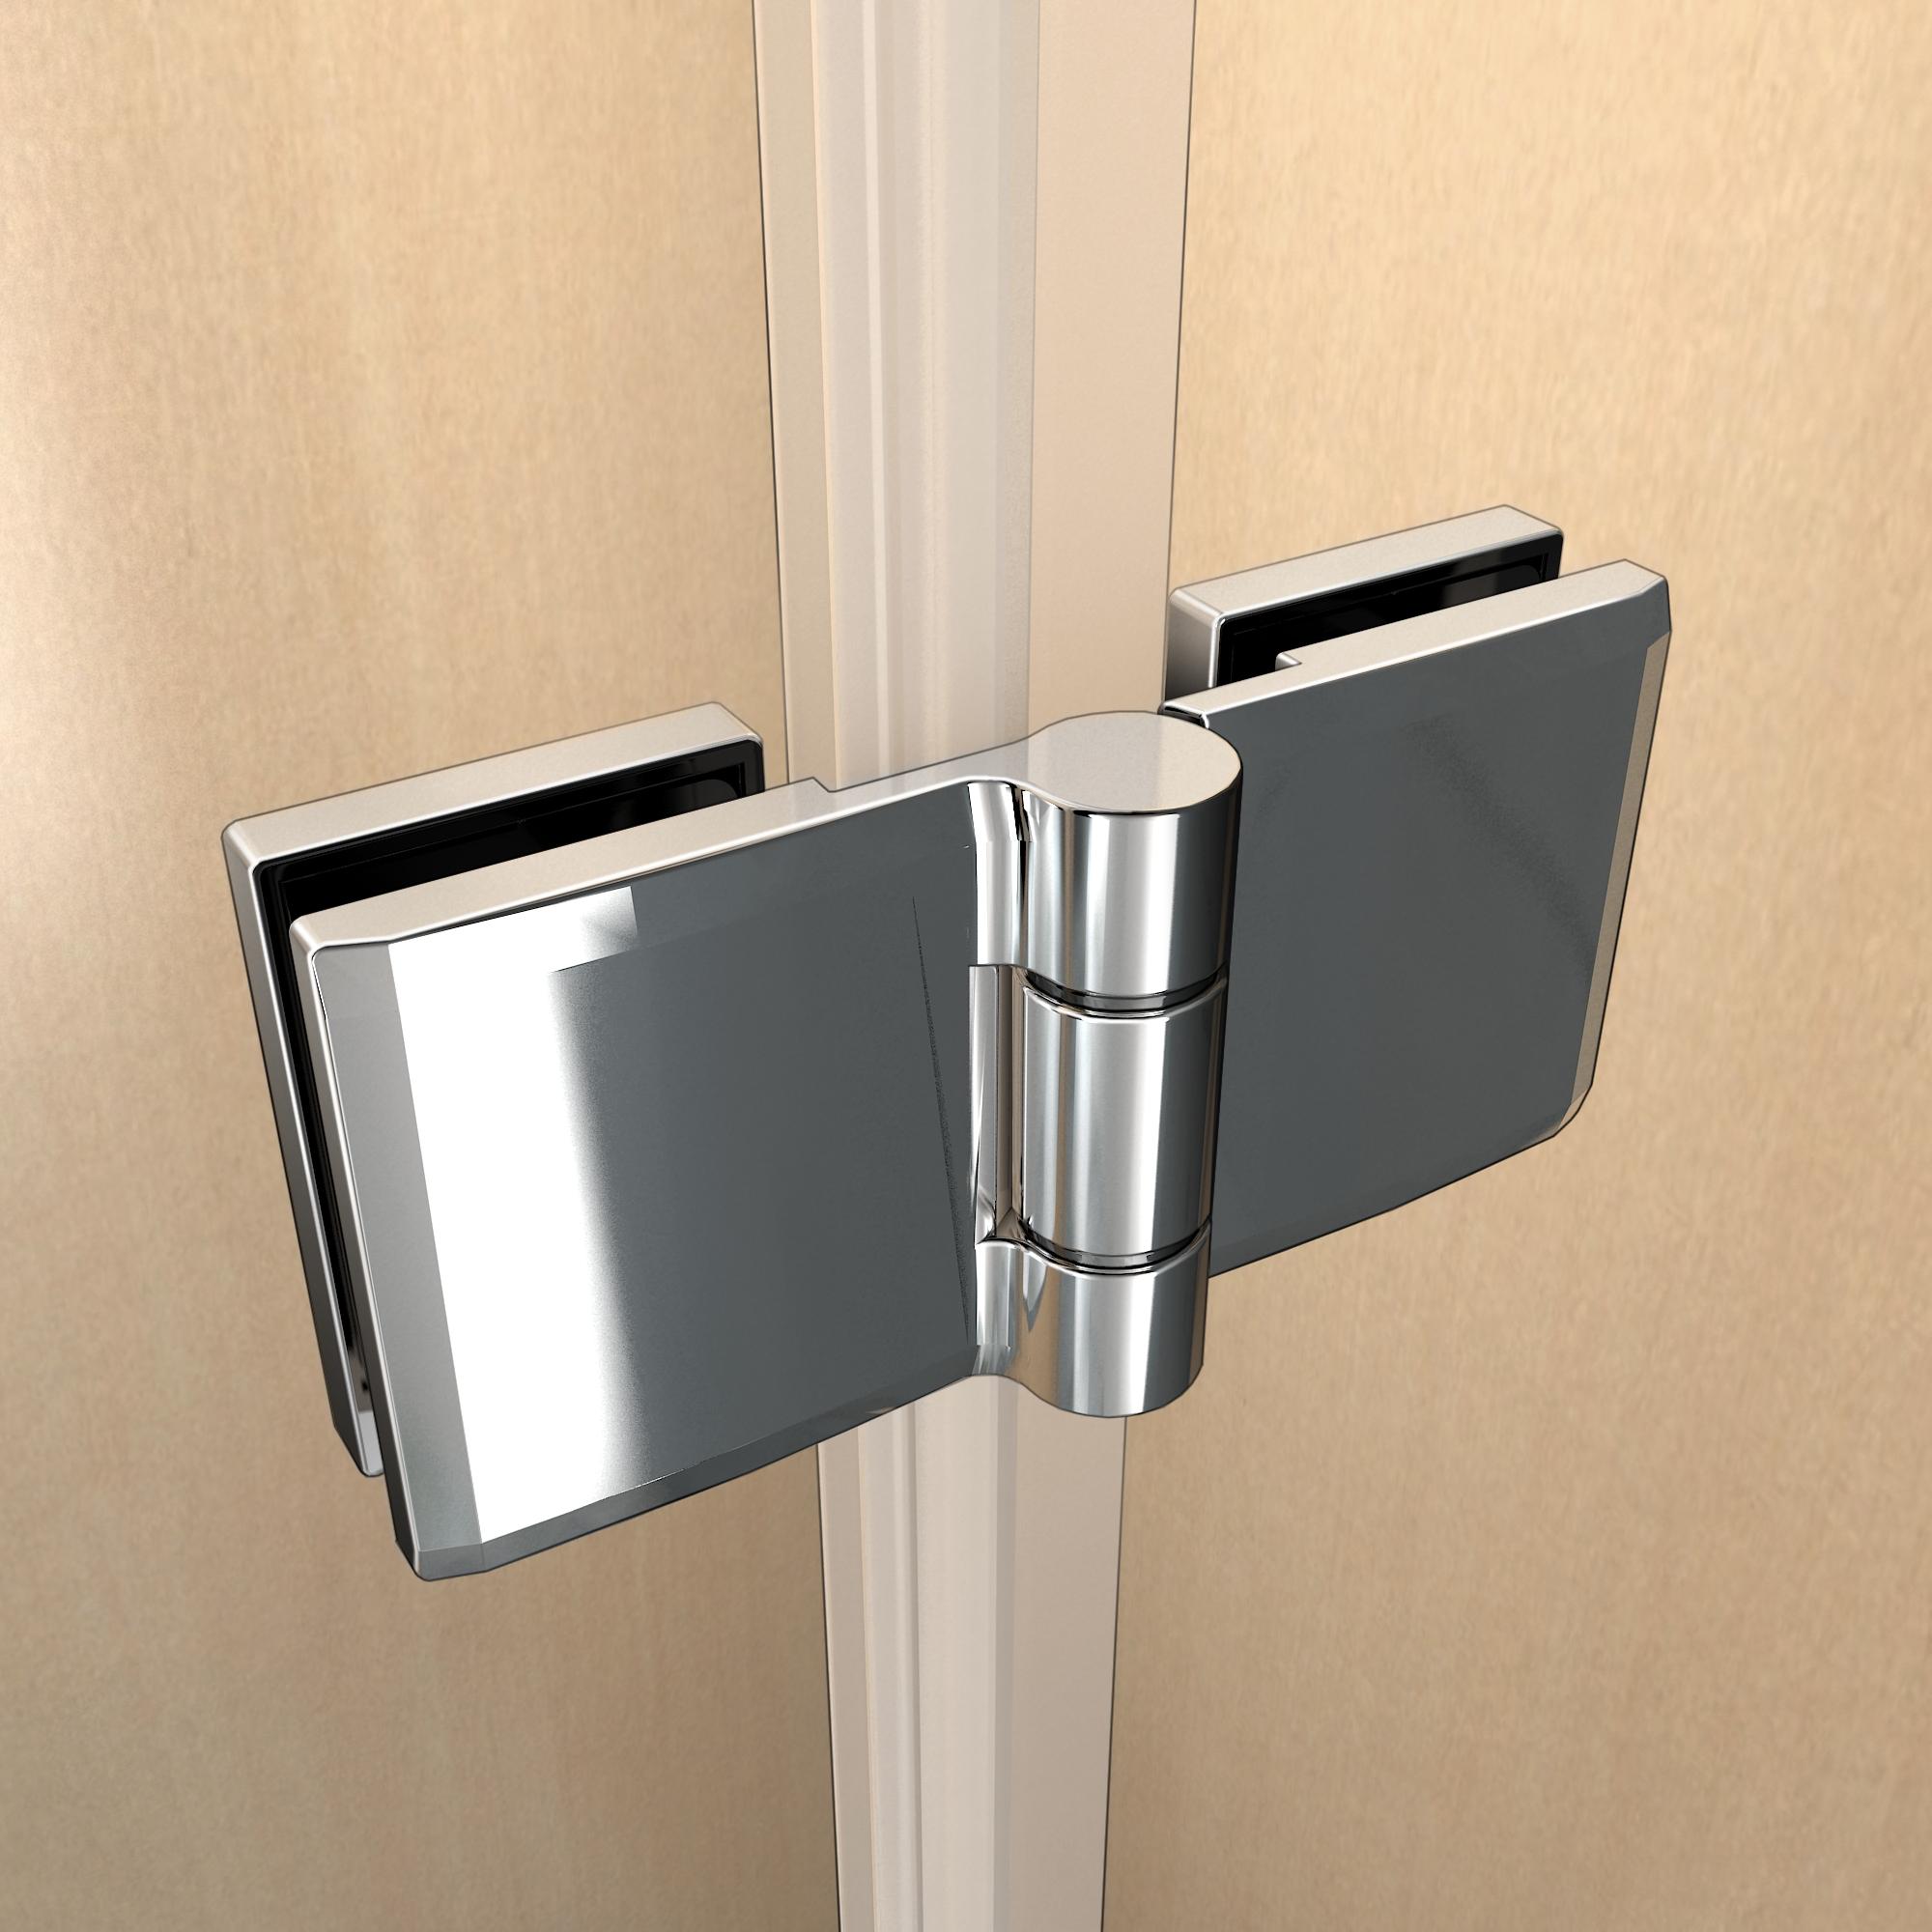 duschkabine duschabtrennung nano glas scharniert r duschwand dusche duschtasse ebay. Black Bedroom Furniture Sets. Home Design Ideas